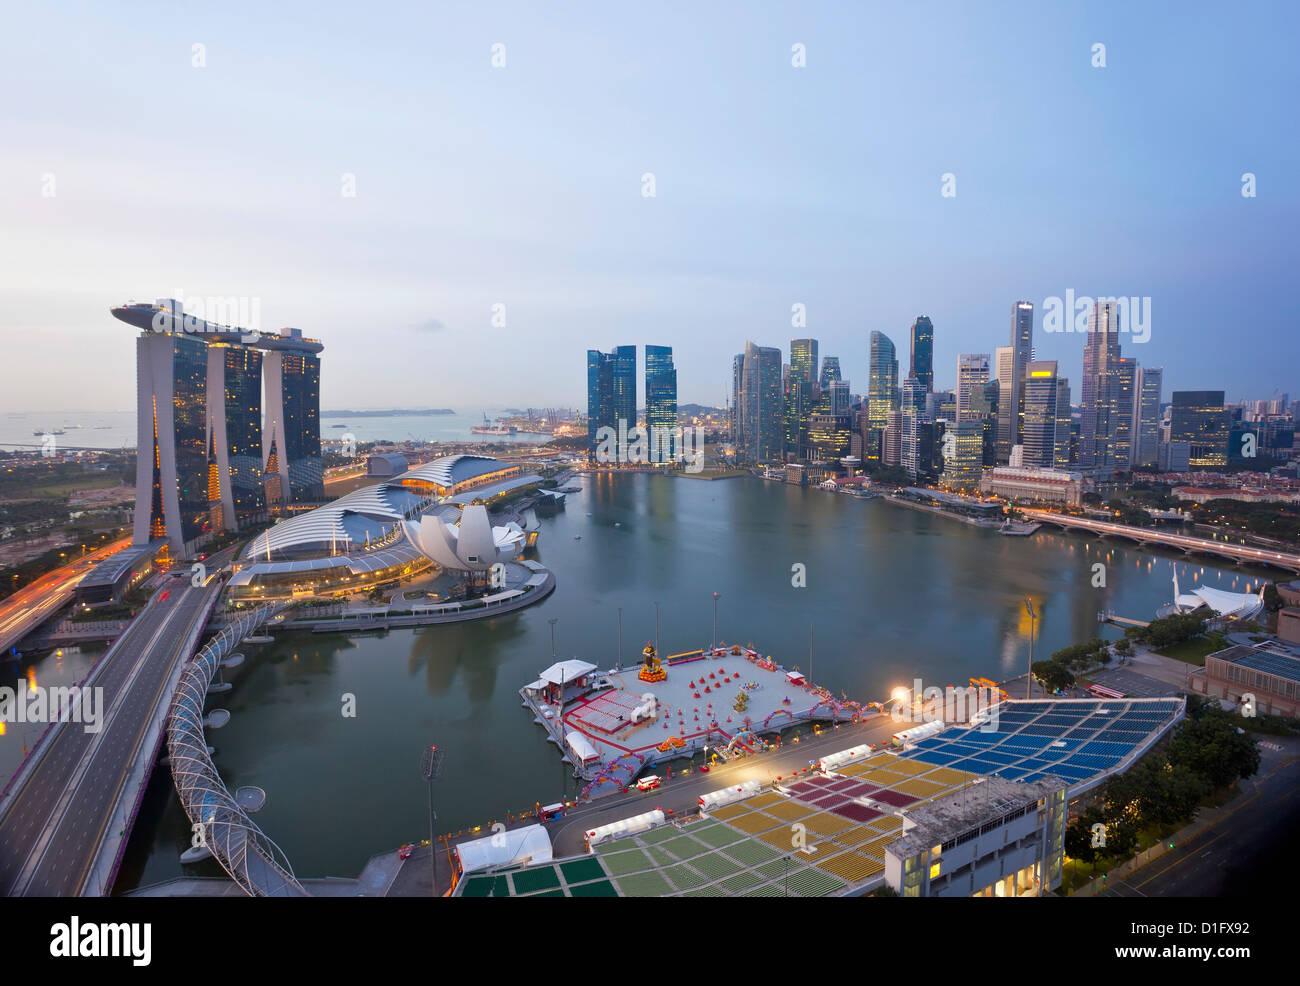 The Helix Bridge and Marina Bay Sands, elevated view over  Singapore, Marina Bay, Singapore, Southeast Asia, Asia Stock Photo